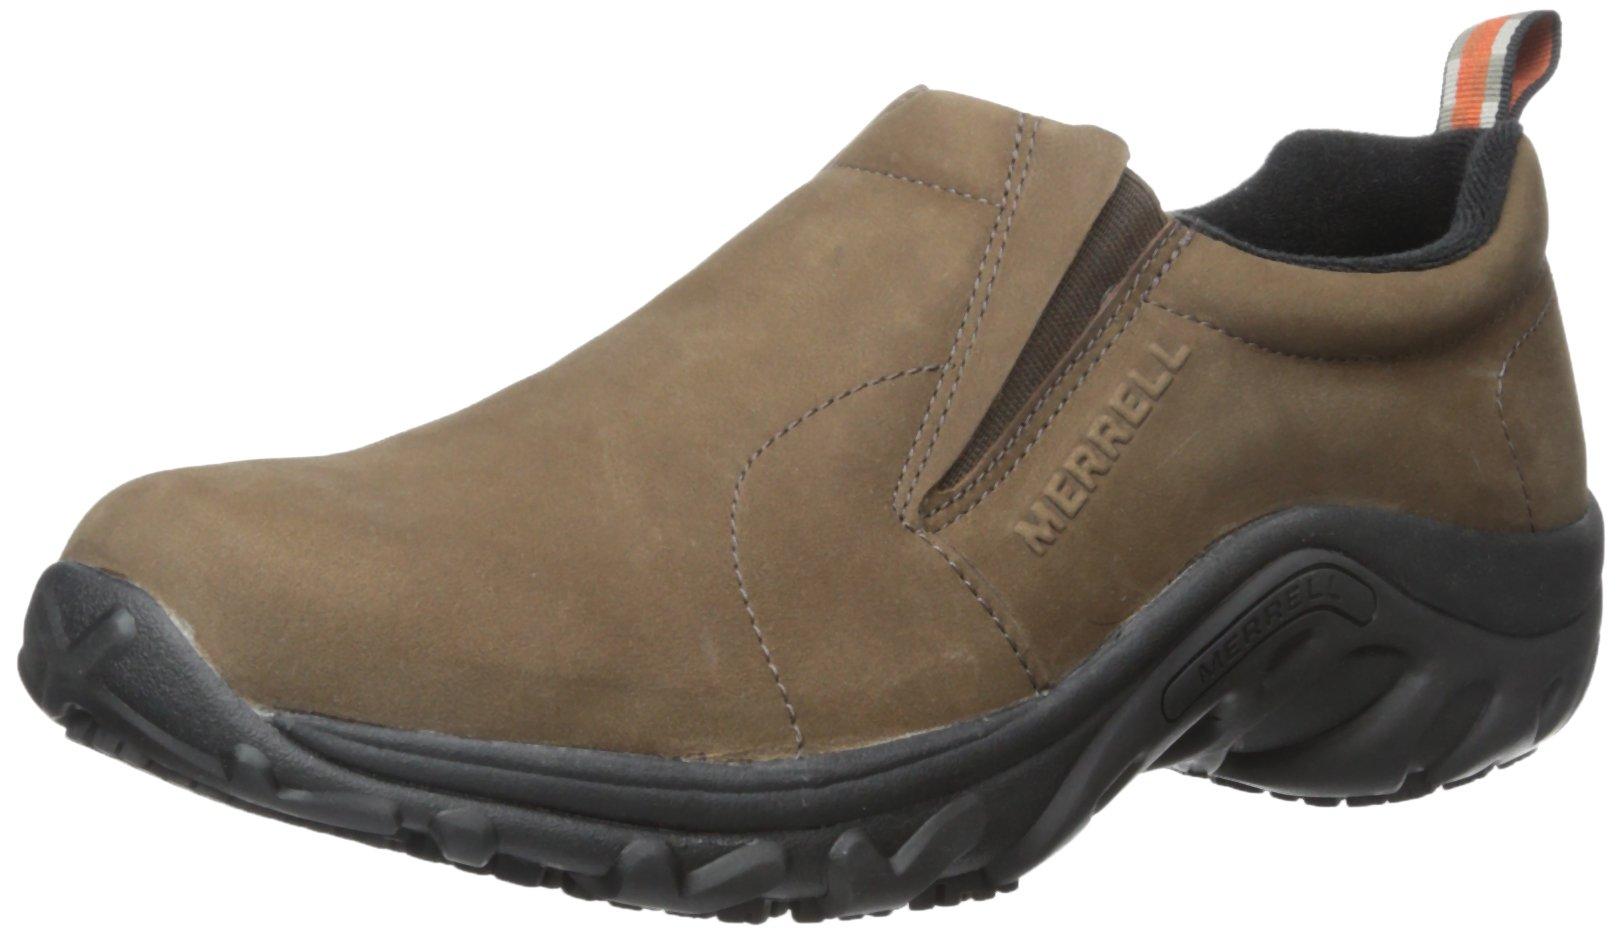 Merrell Men's Jungle Moc Pro Grip Nubuck Slip-Resistant Work Shoe, Brown, 8 M US